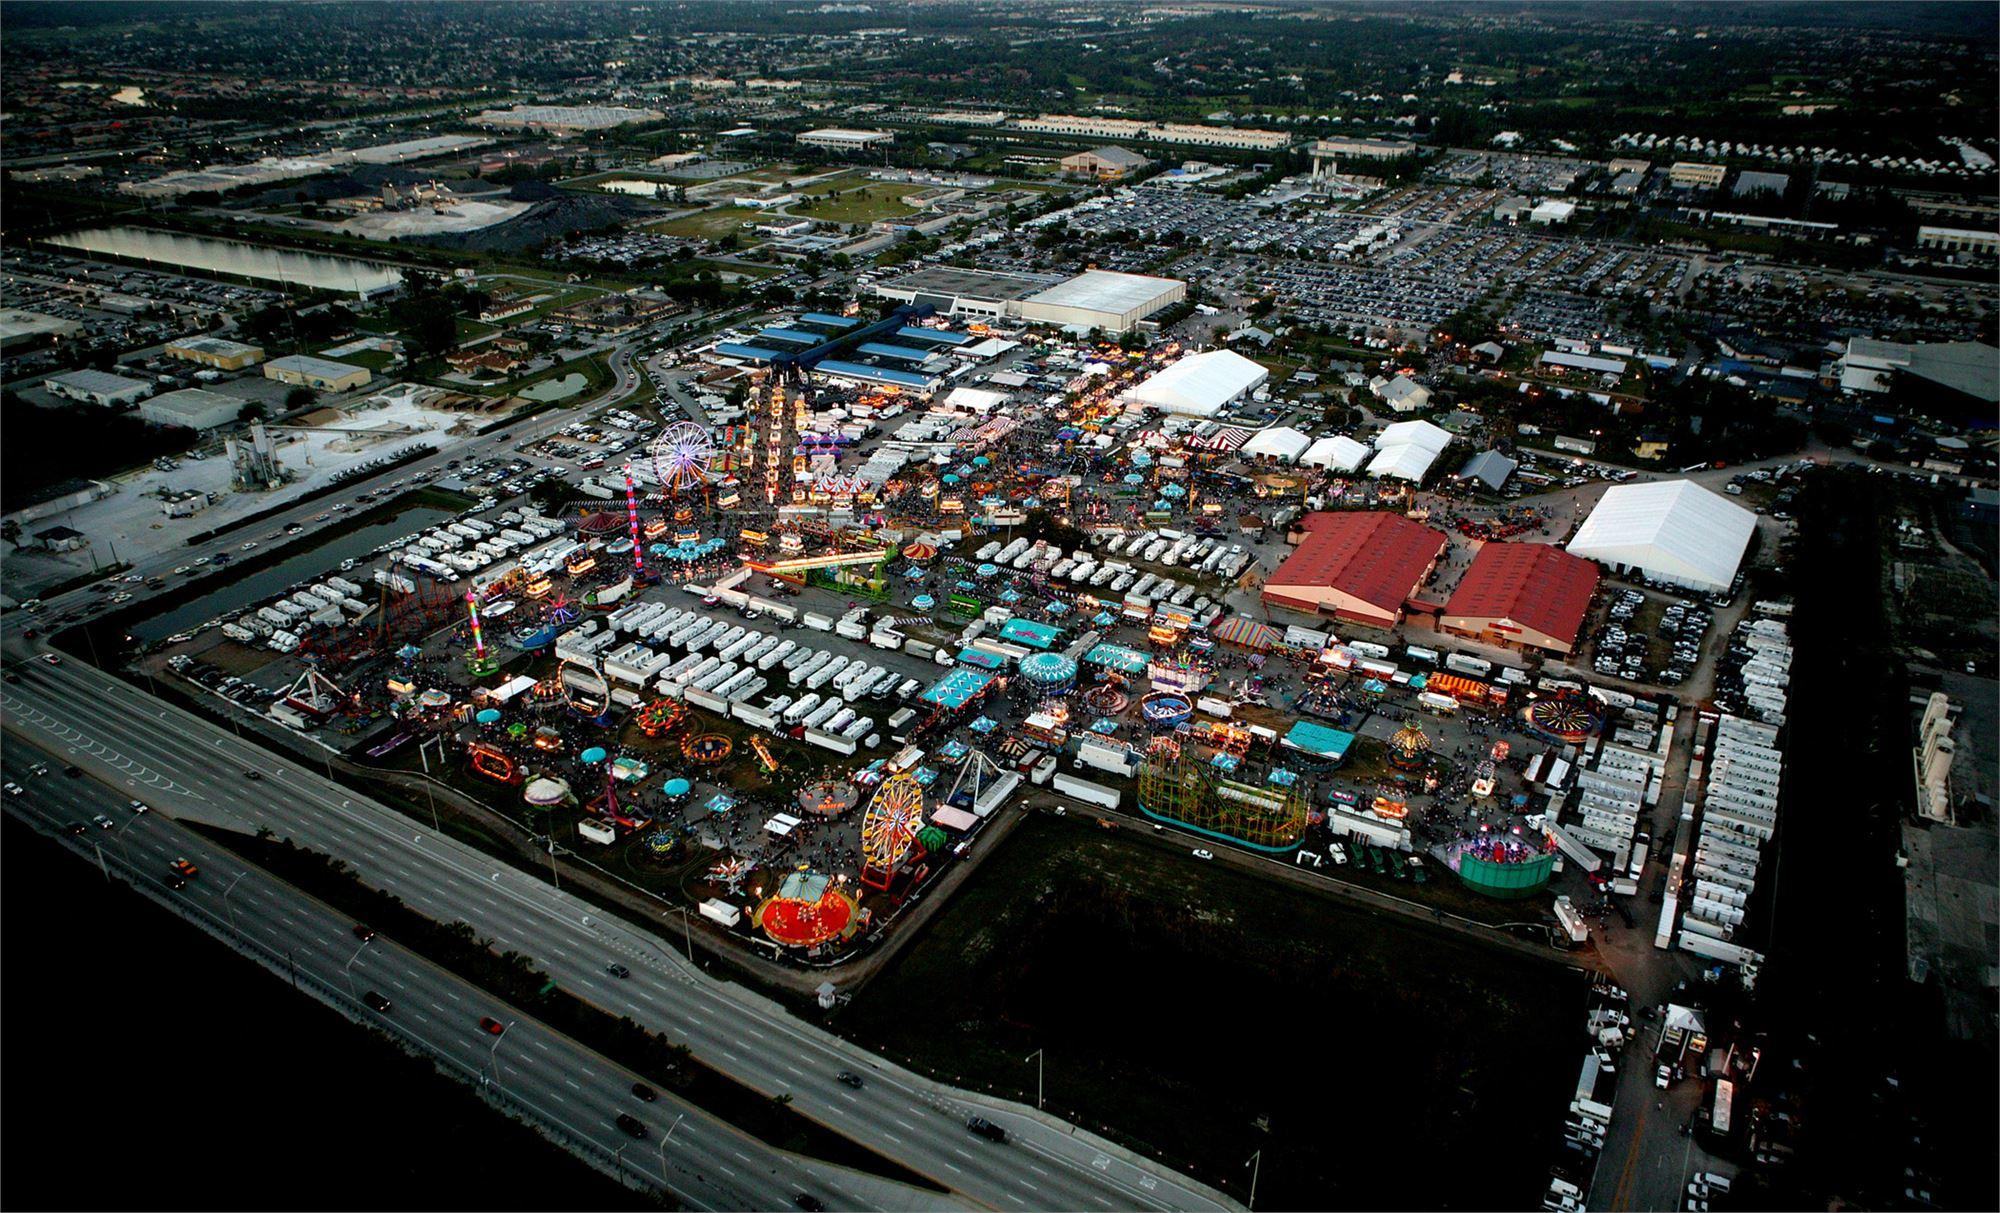 South Florida Fair   West Palm Beach, Fl   561.793.0333 Regarding Florida State Fairgrounds Events 2021